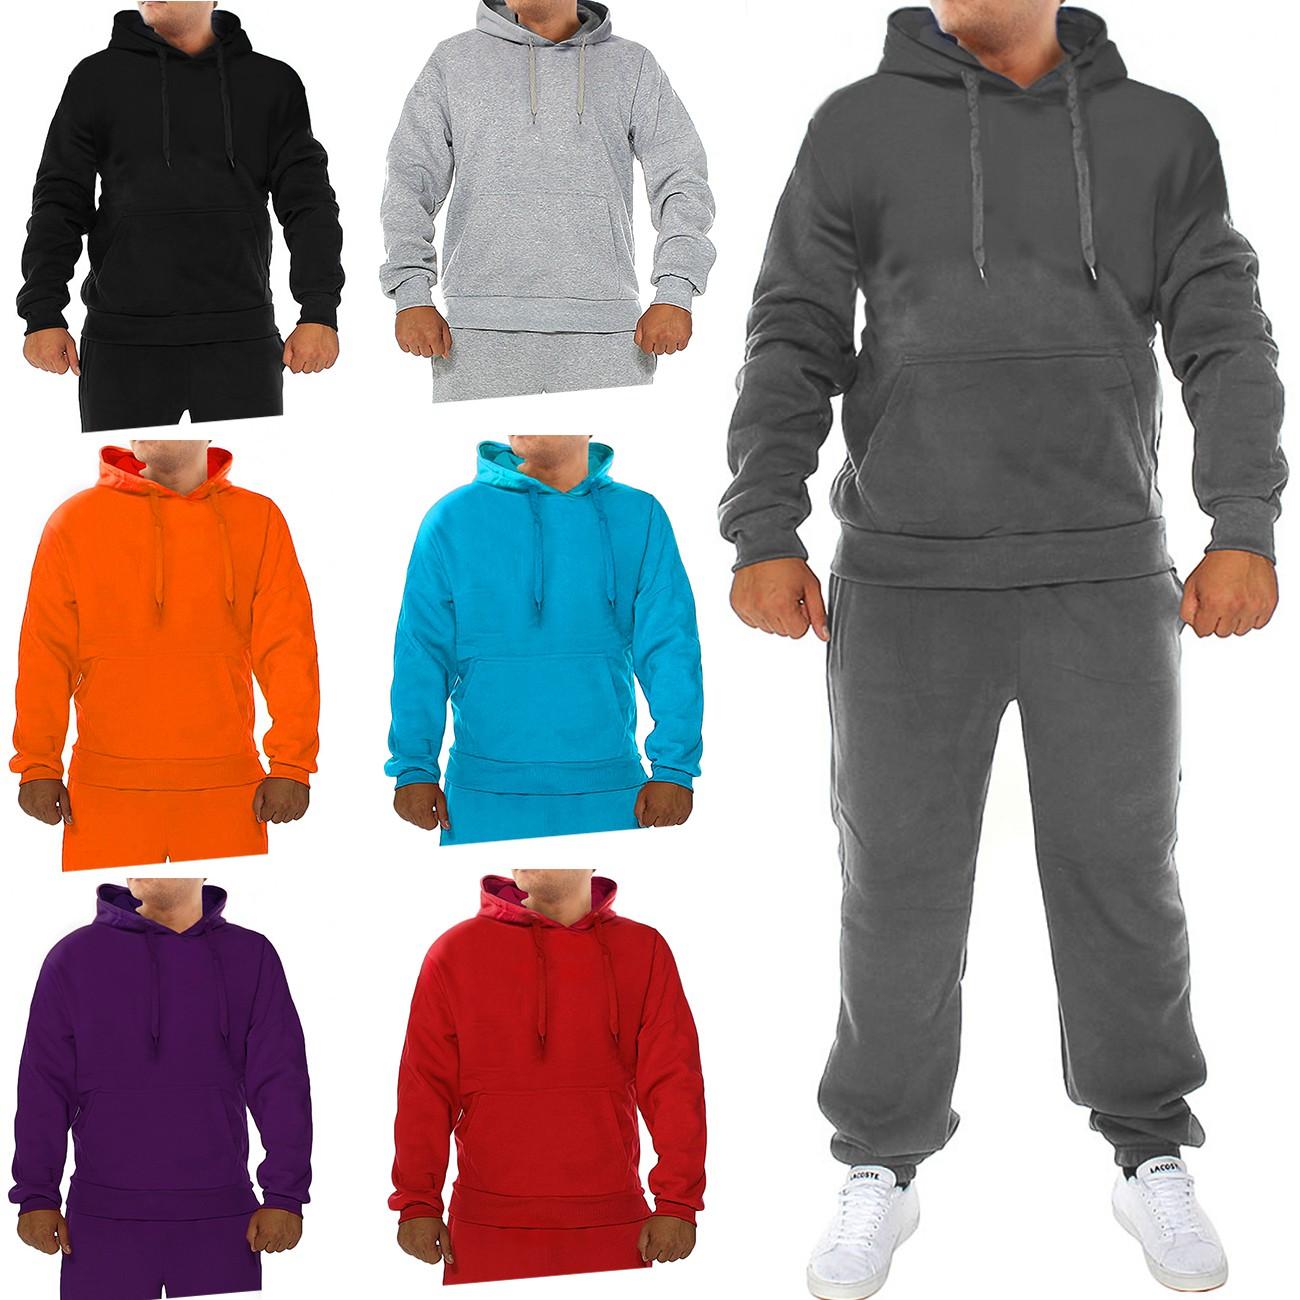 herren damen unisex jogginganzug anzug suit sportanzug jogging dangerous basic ebay. Black Bedroom Furniture Sets. Home Design Ideas